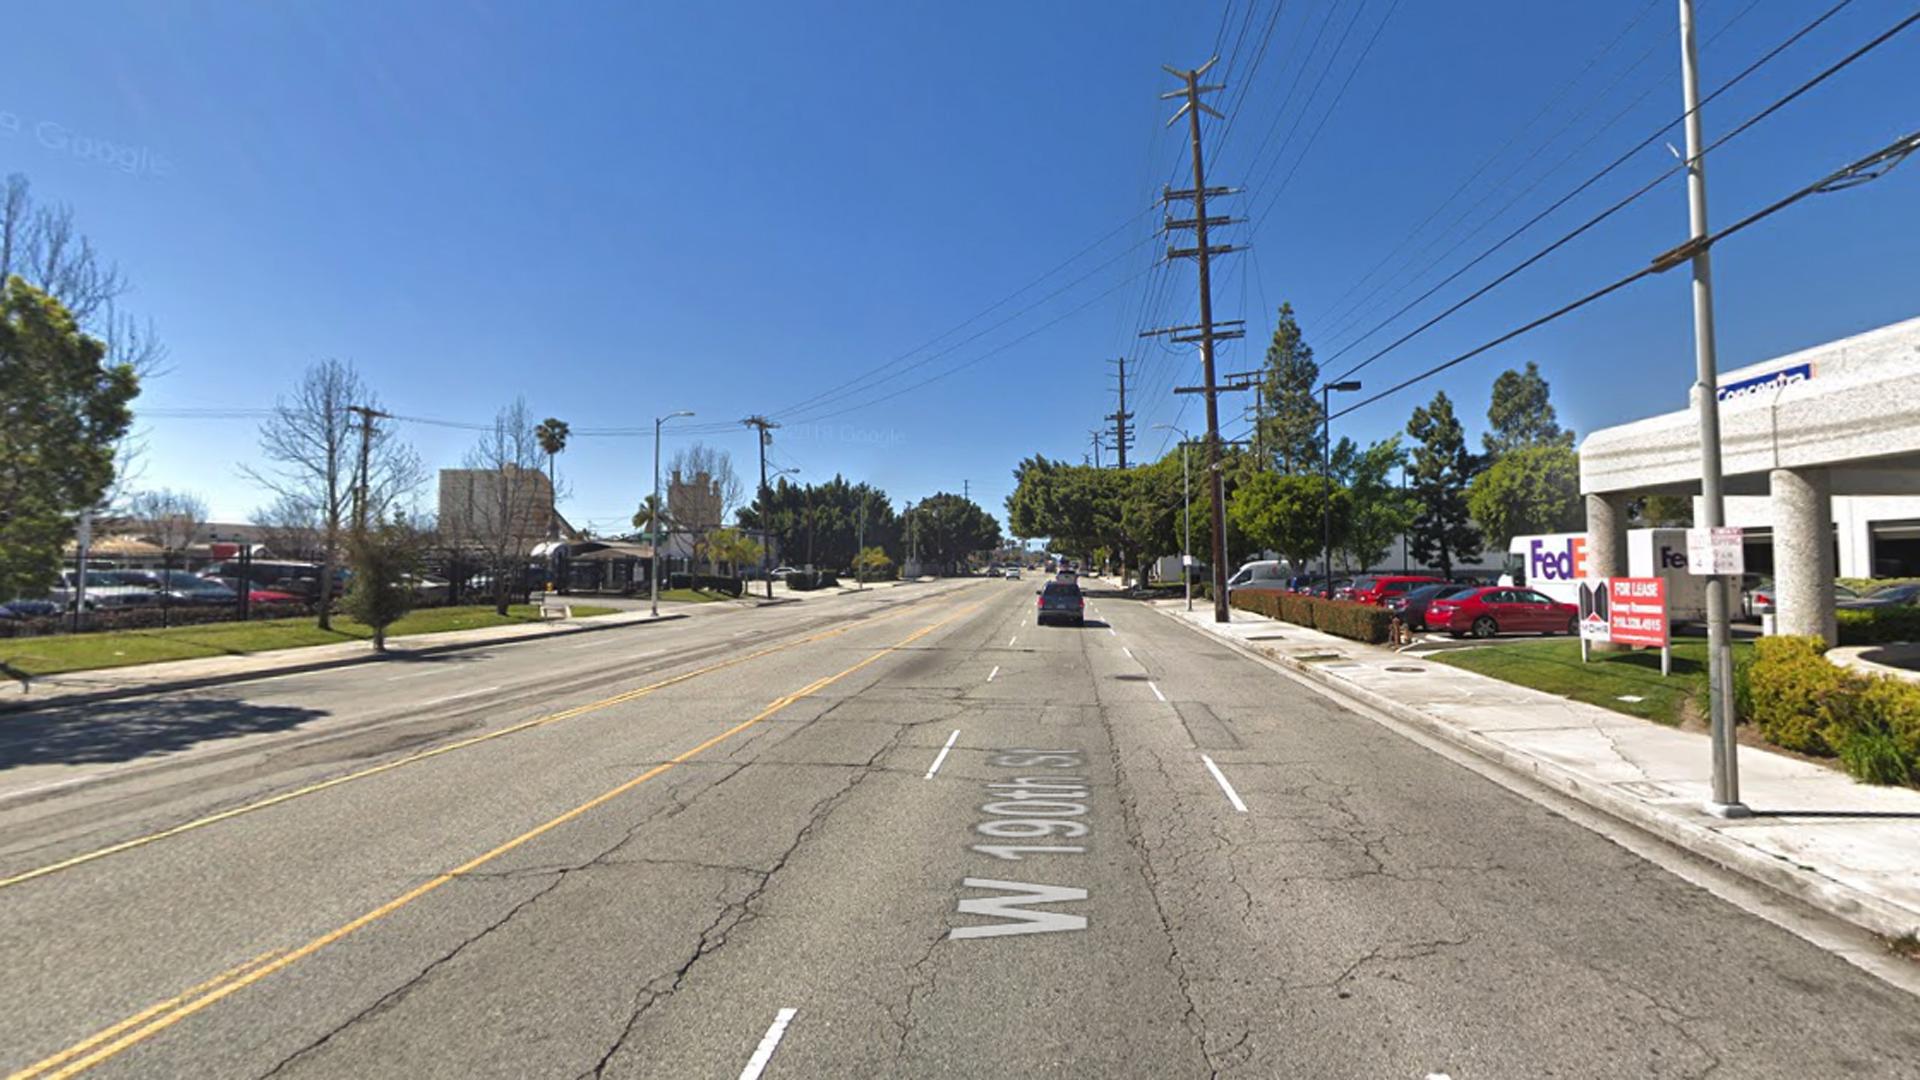 The 1000 block of West 190th Street in the Harbor Gateway neighborhood of Los Angeles, as viewed in a Google Street View image.